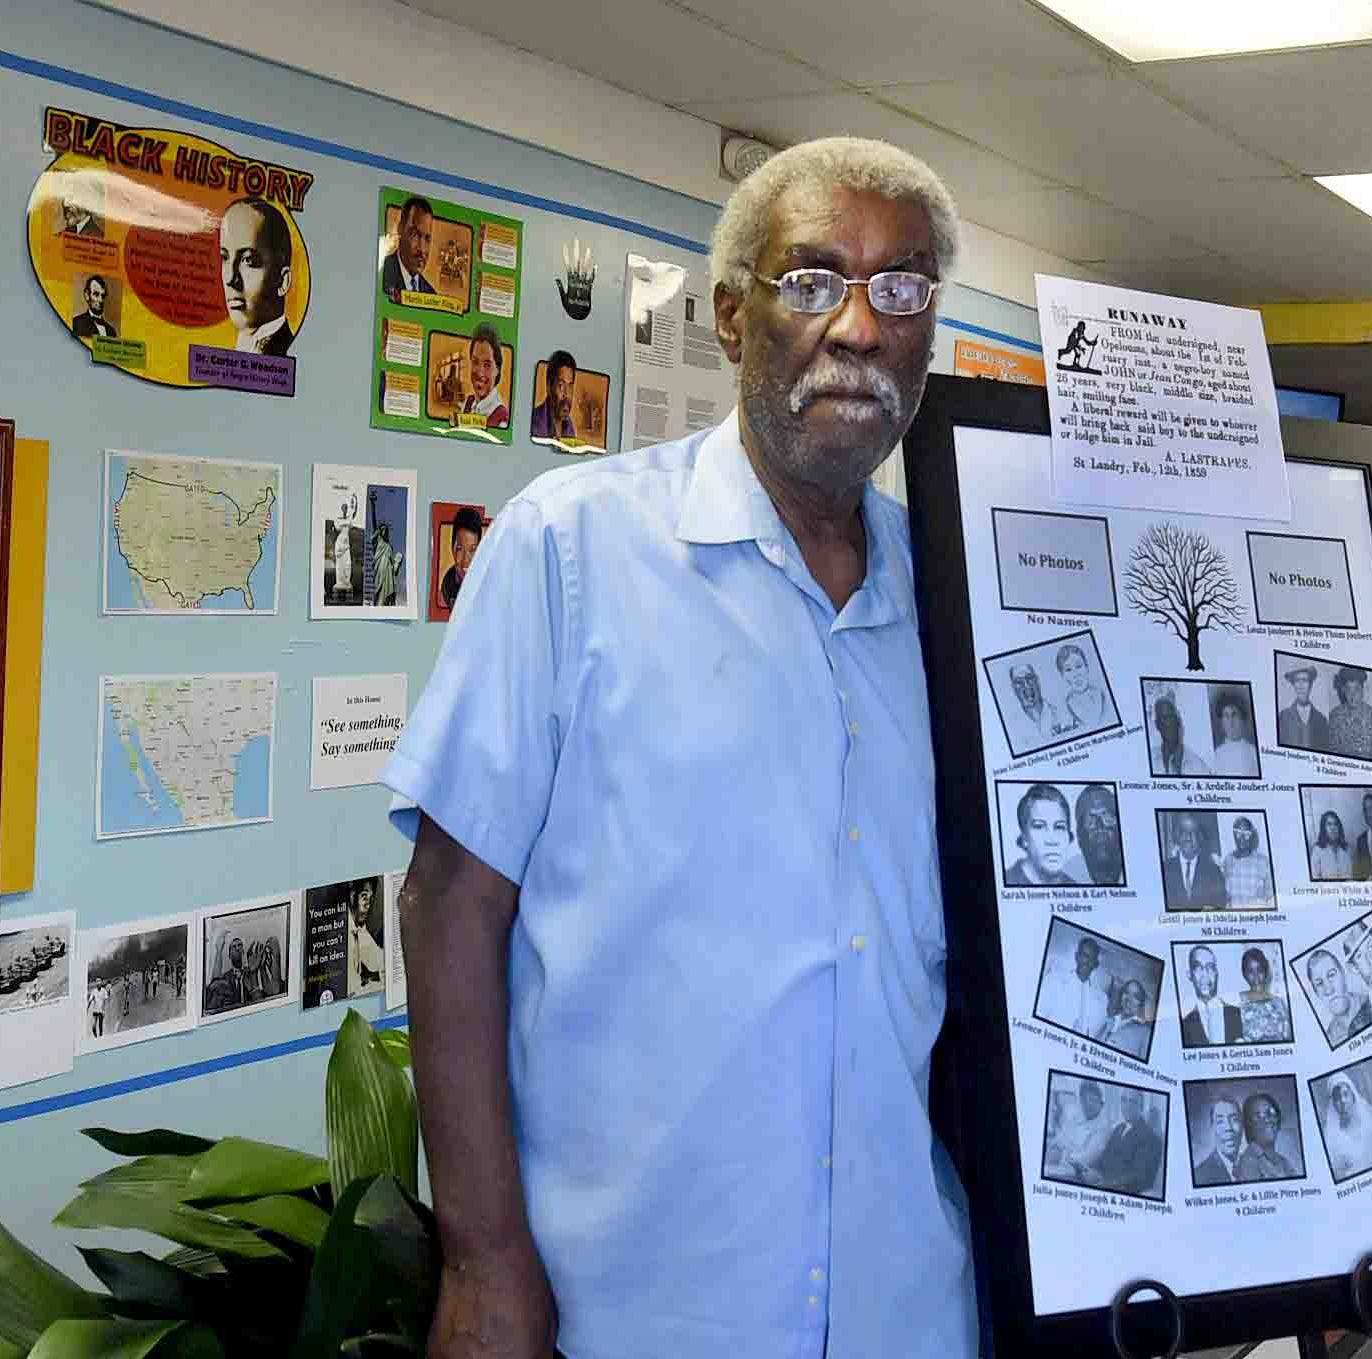 Museum spotlights African American history in St. Landry Parish